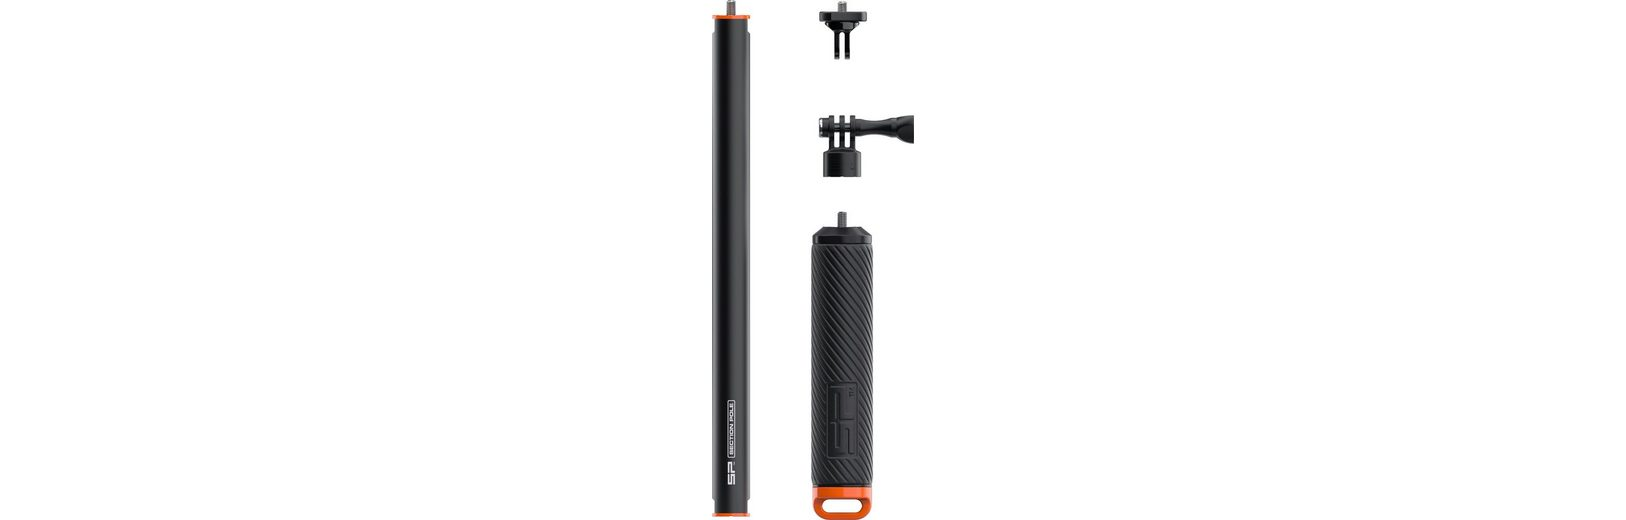 SP GADGETS wasserfeste Pole-Set für GoPro »Section Pole Set«